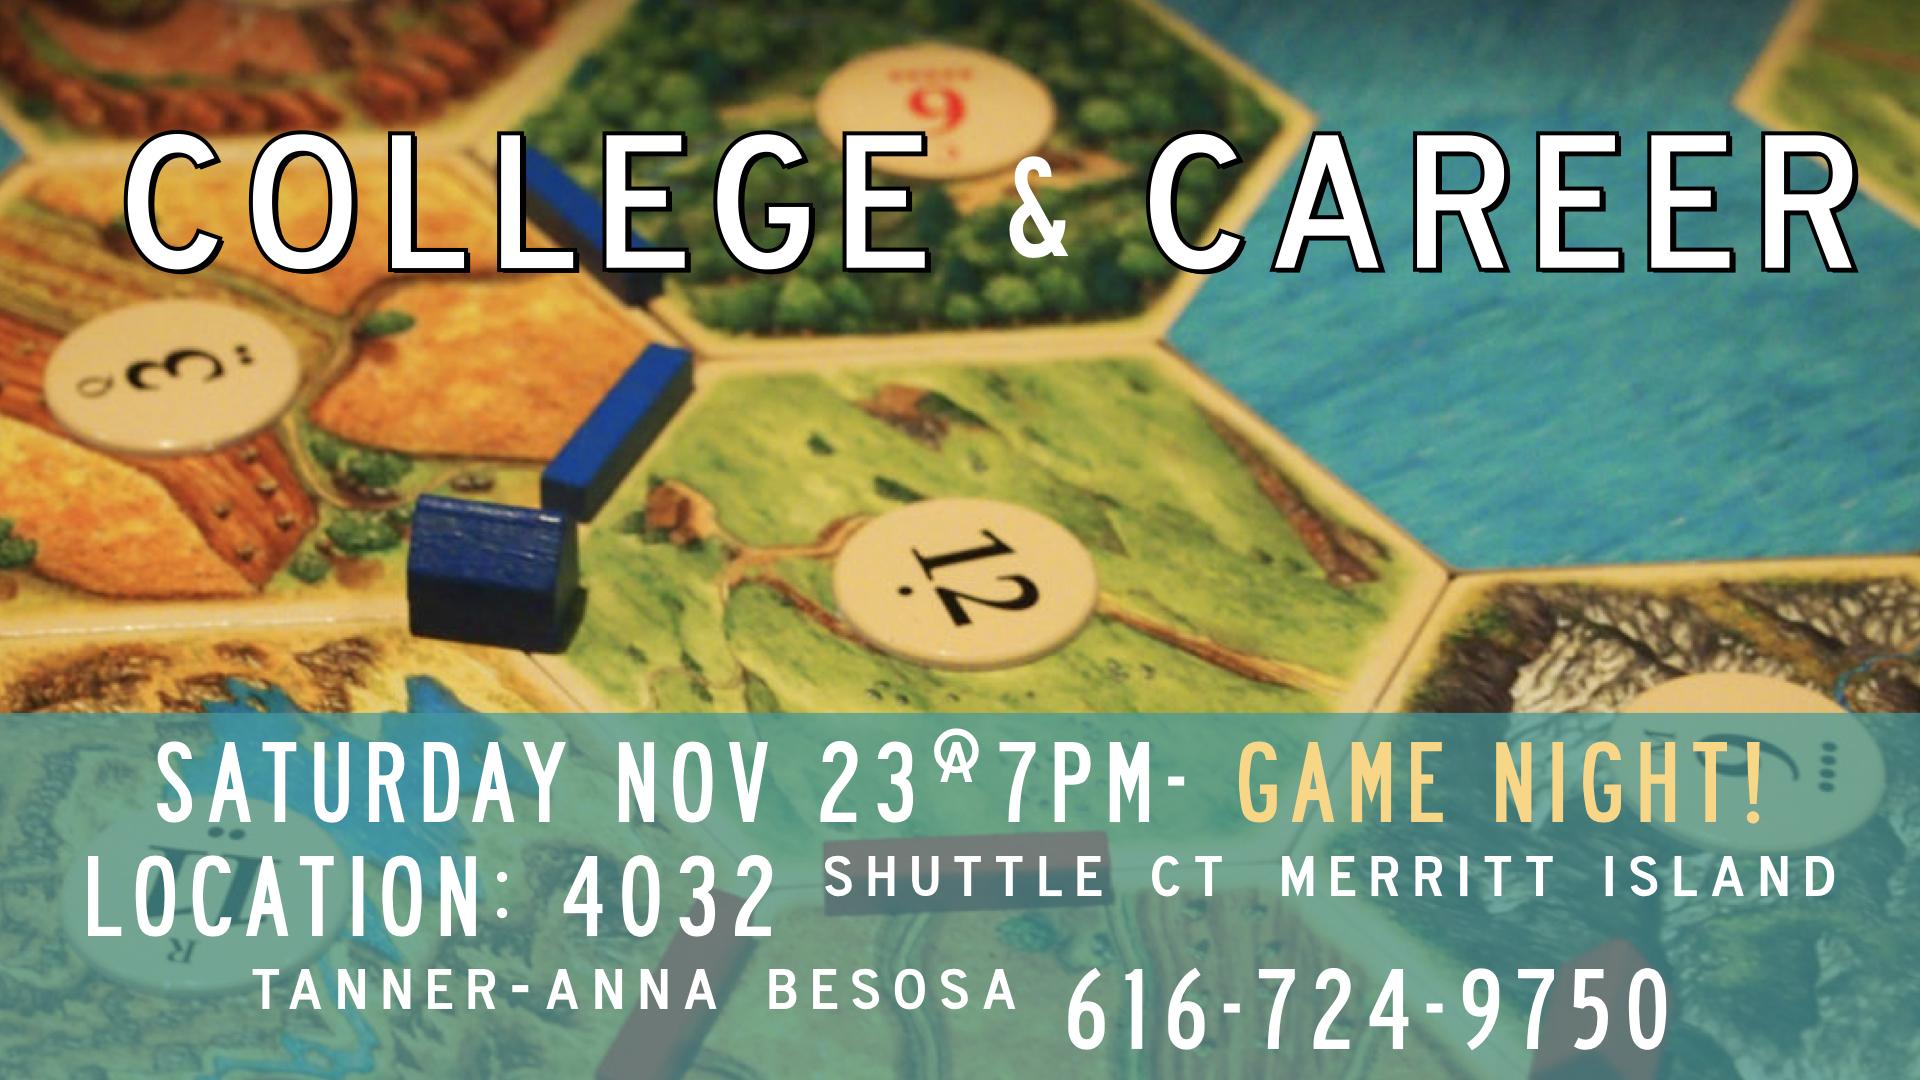 TCC Graphics - College & Career Game Night.001.jpeg